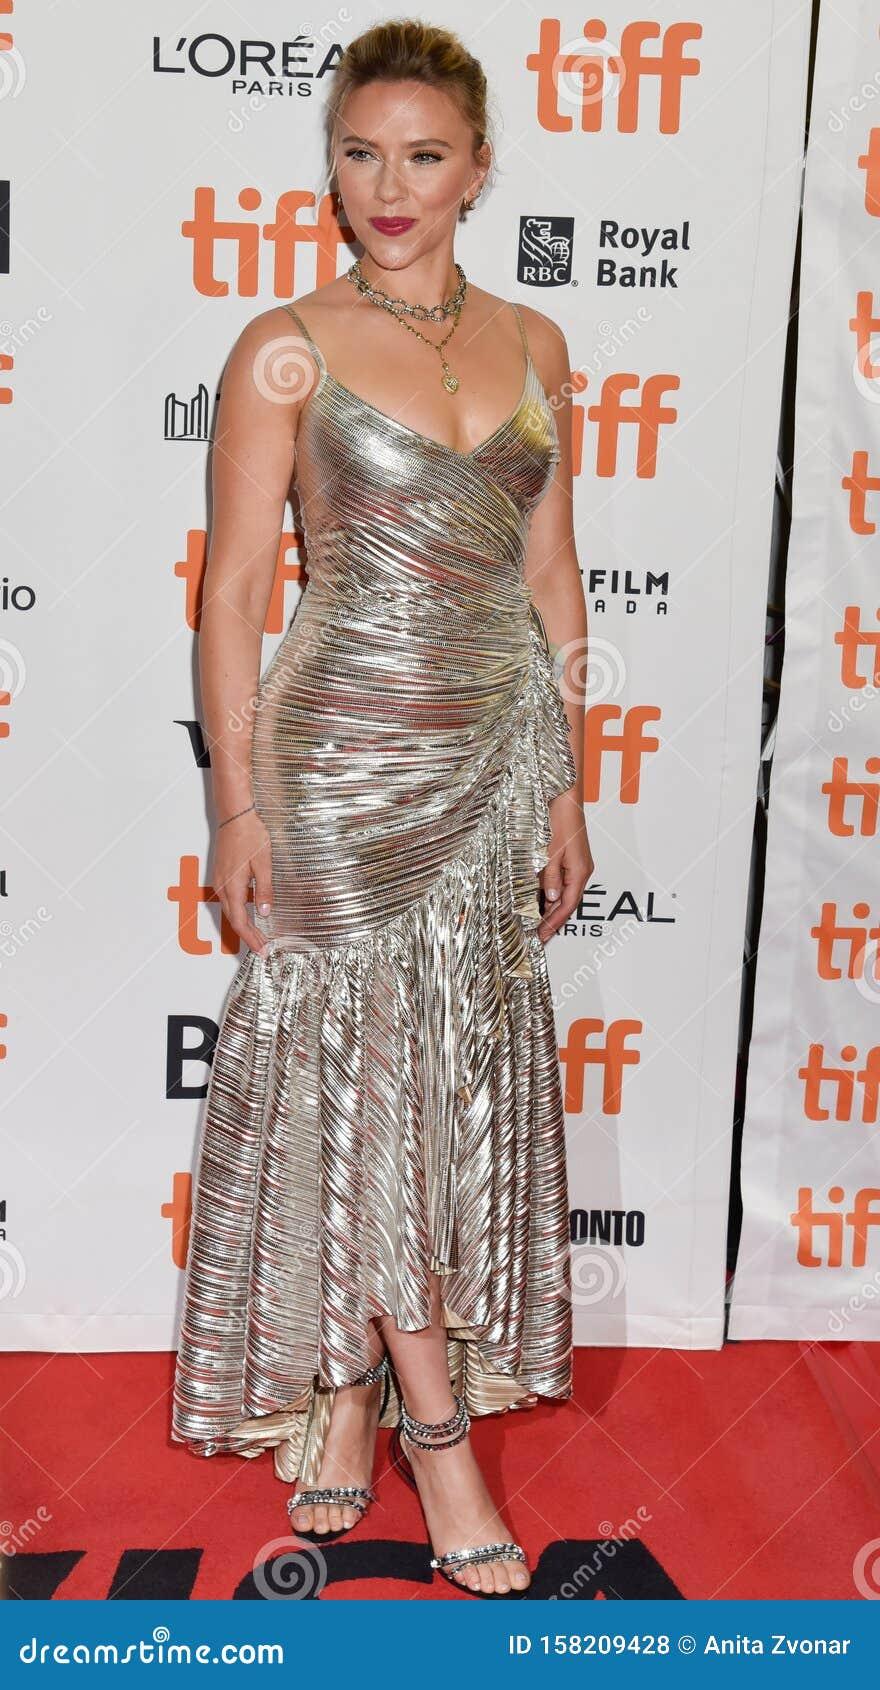 Scarlett Johansson on red carpet for Jojo Rabbit movie premiere at TIFF